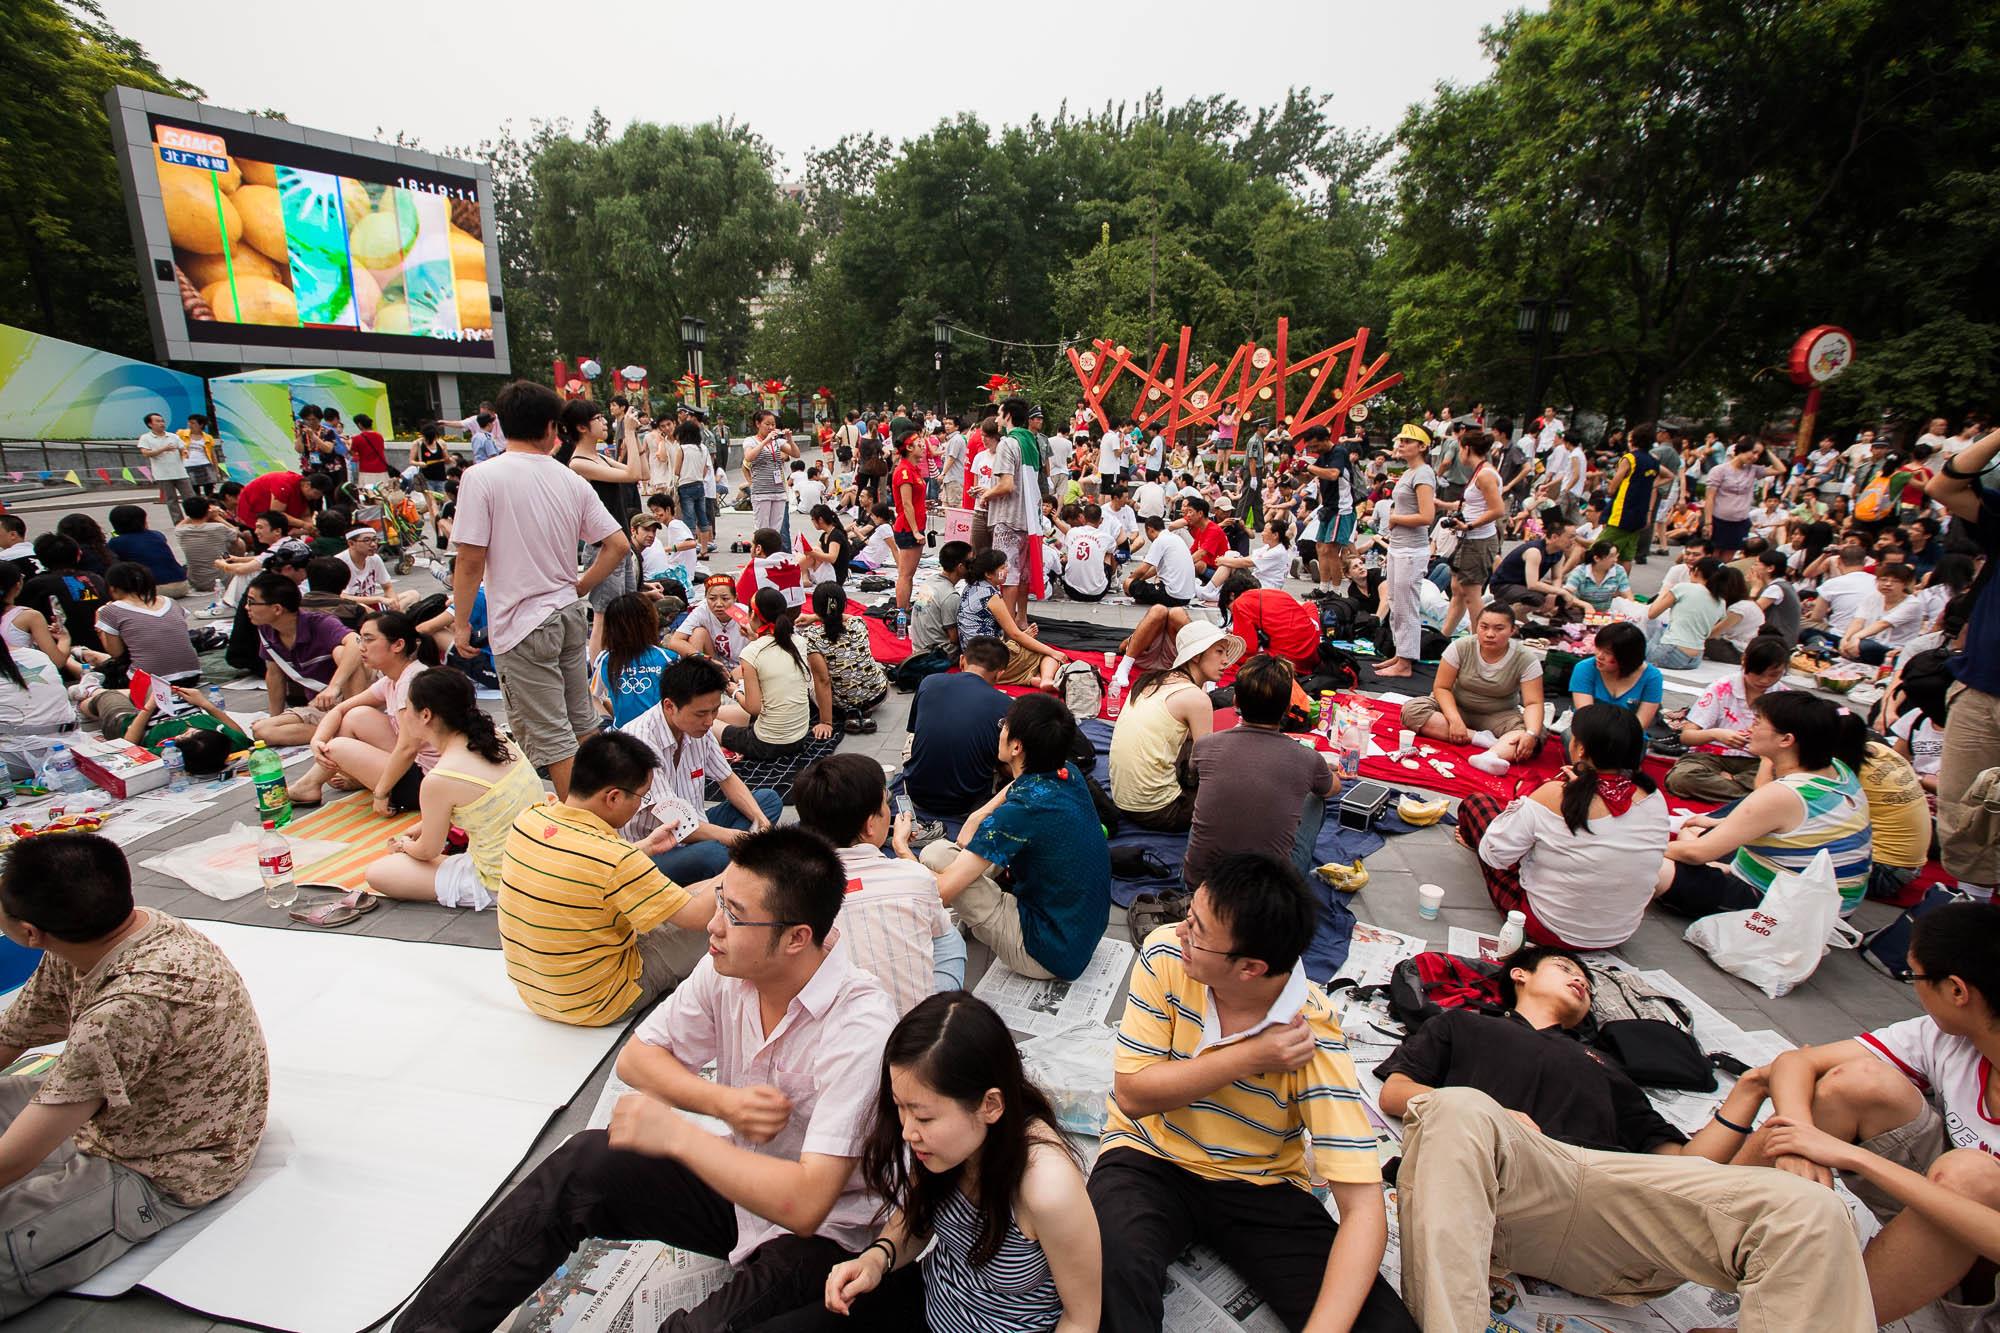 Ditan Park crowd